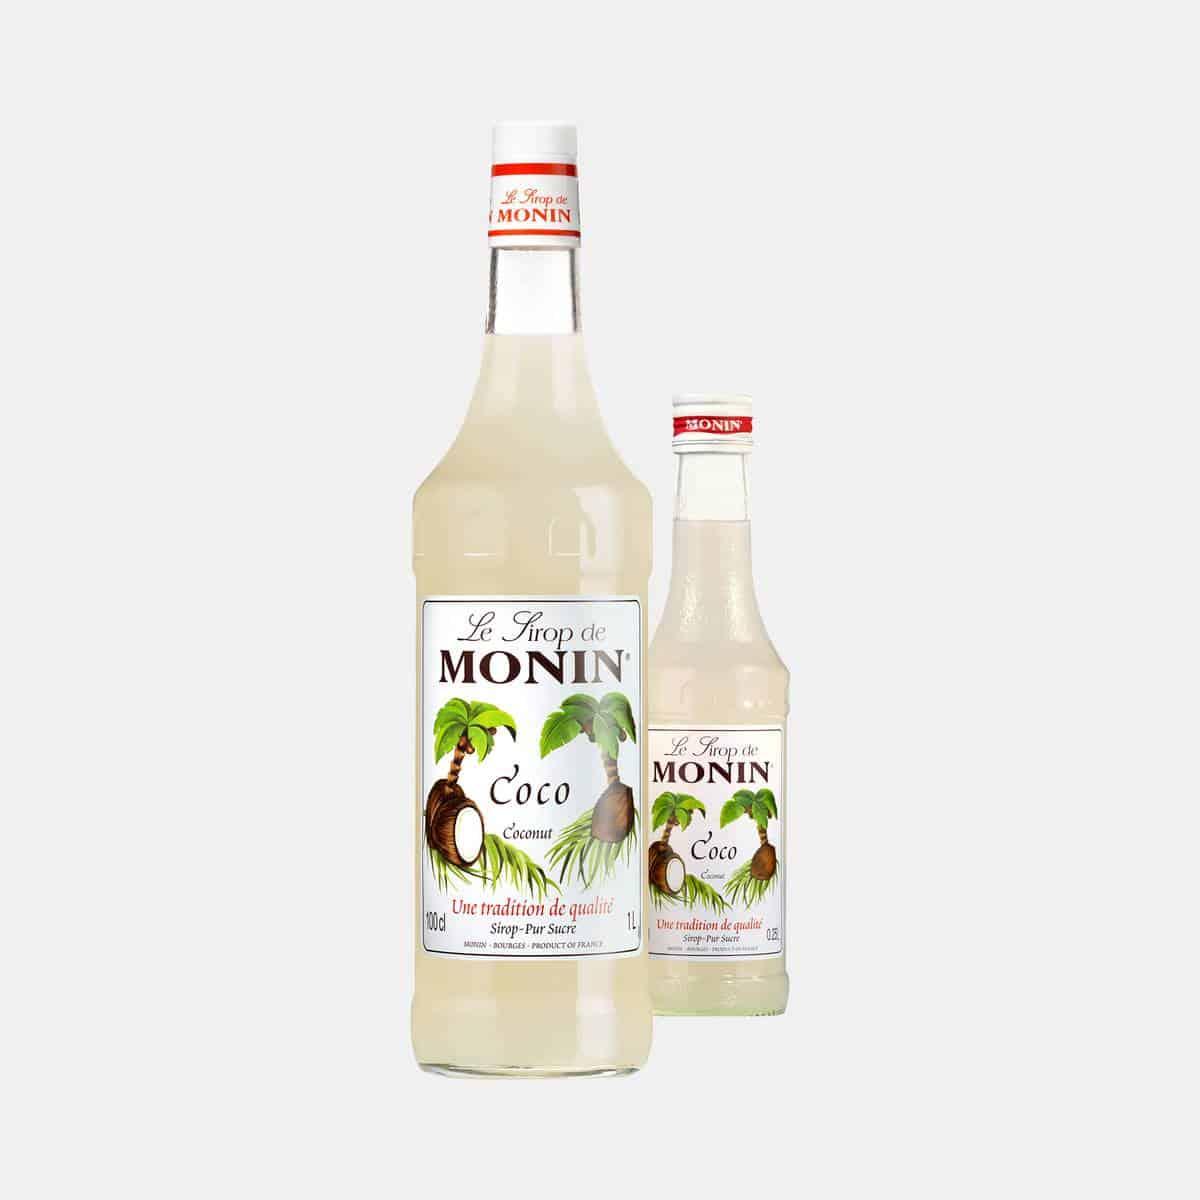 Monin Coconut Syrup Glass Bottles